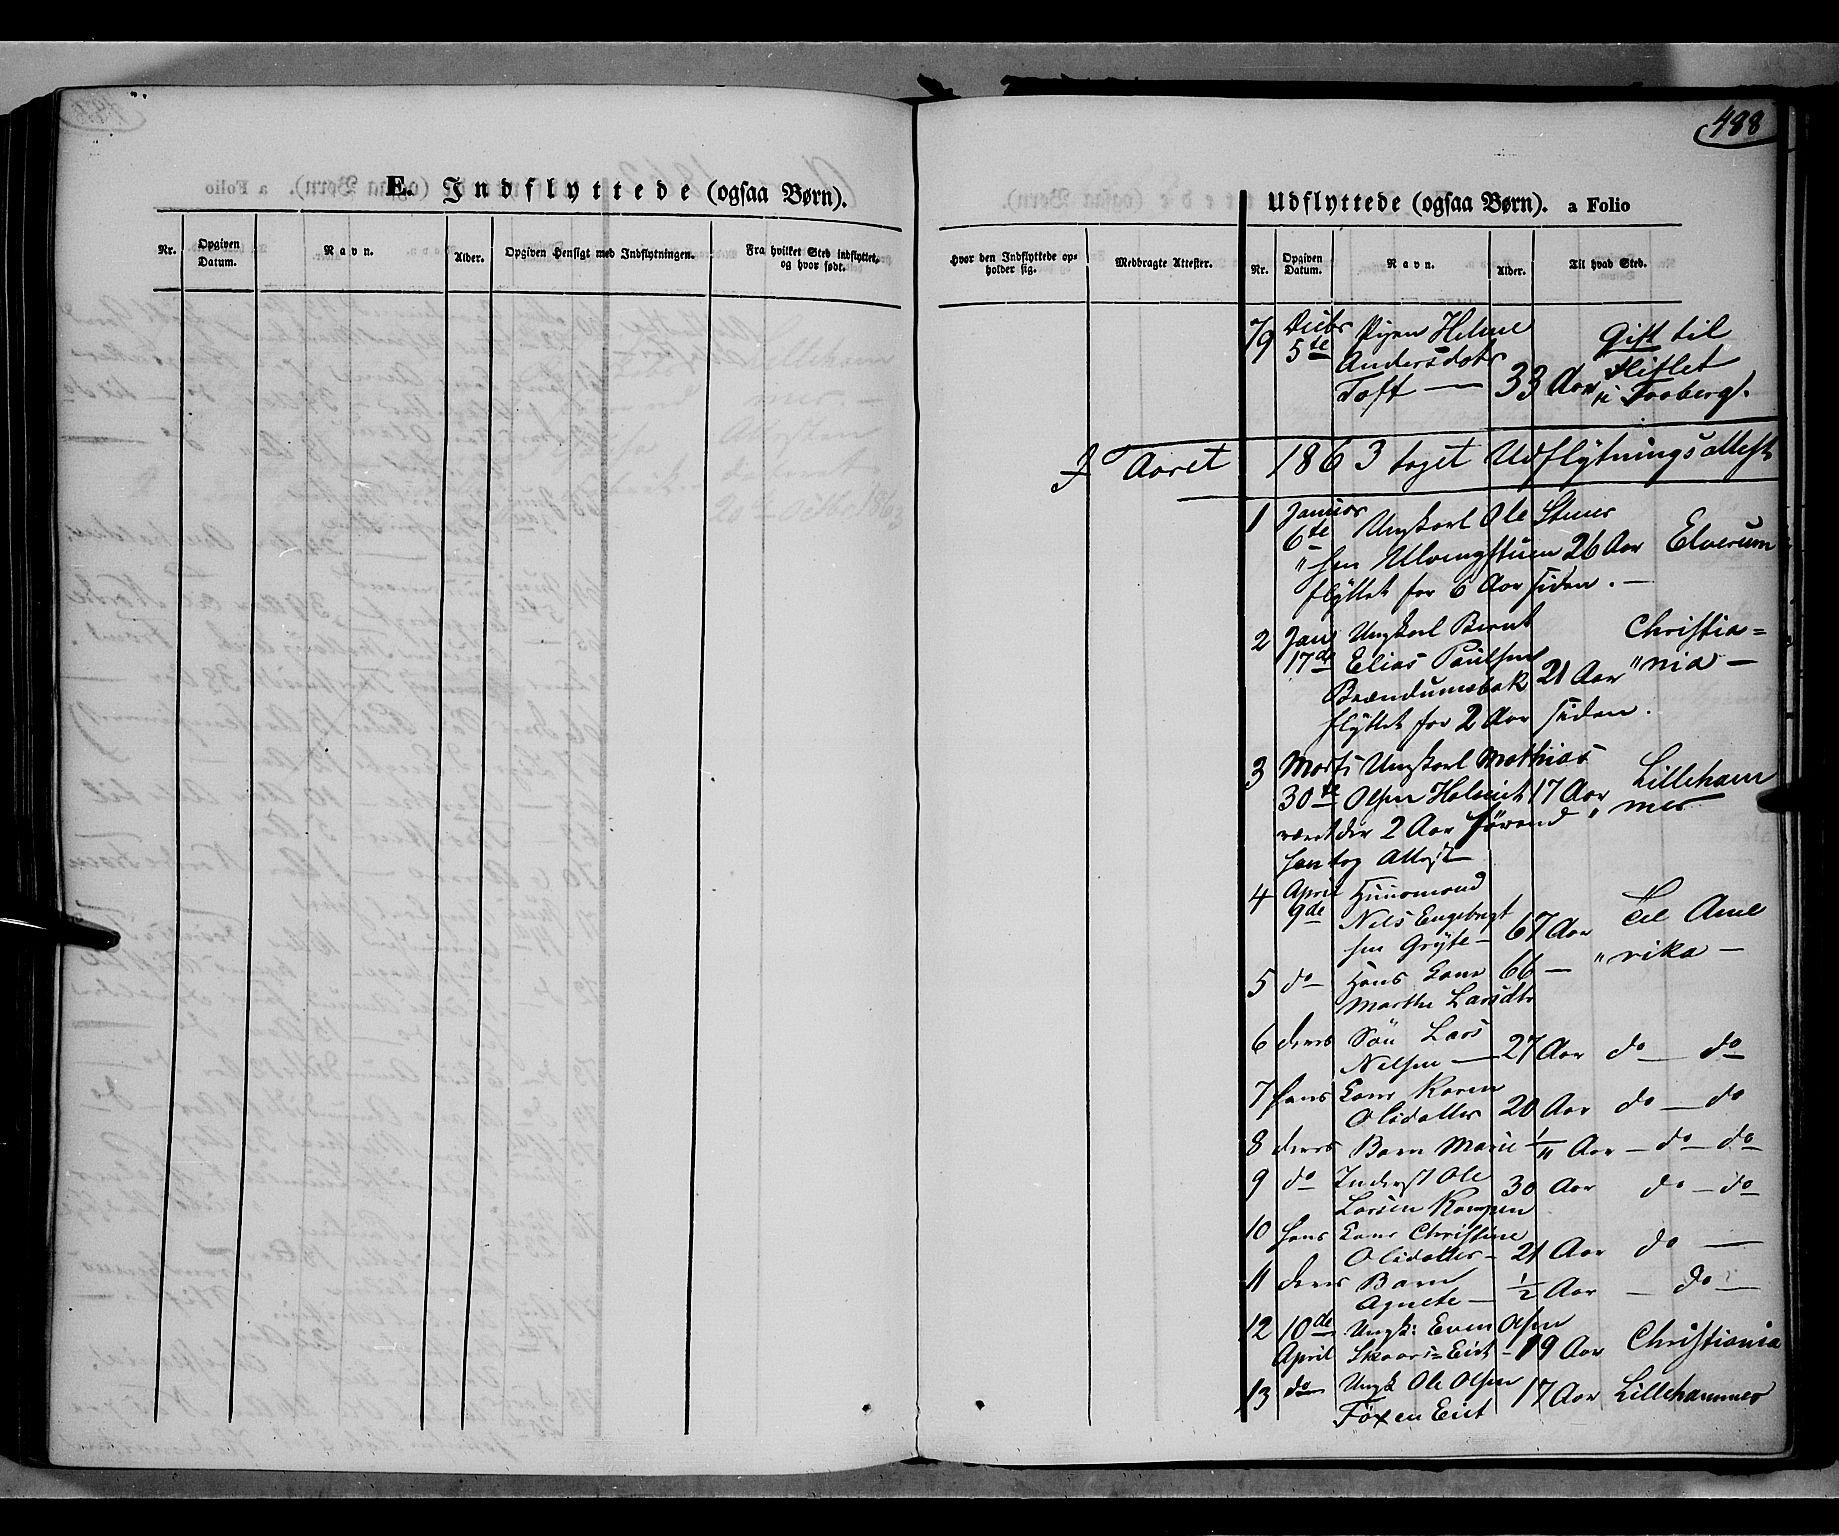 SAH, Gausdal prestekontor, Ministerialbok nr. 9, 1862-1873, s. 488